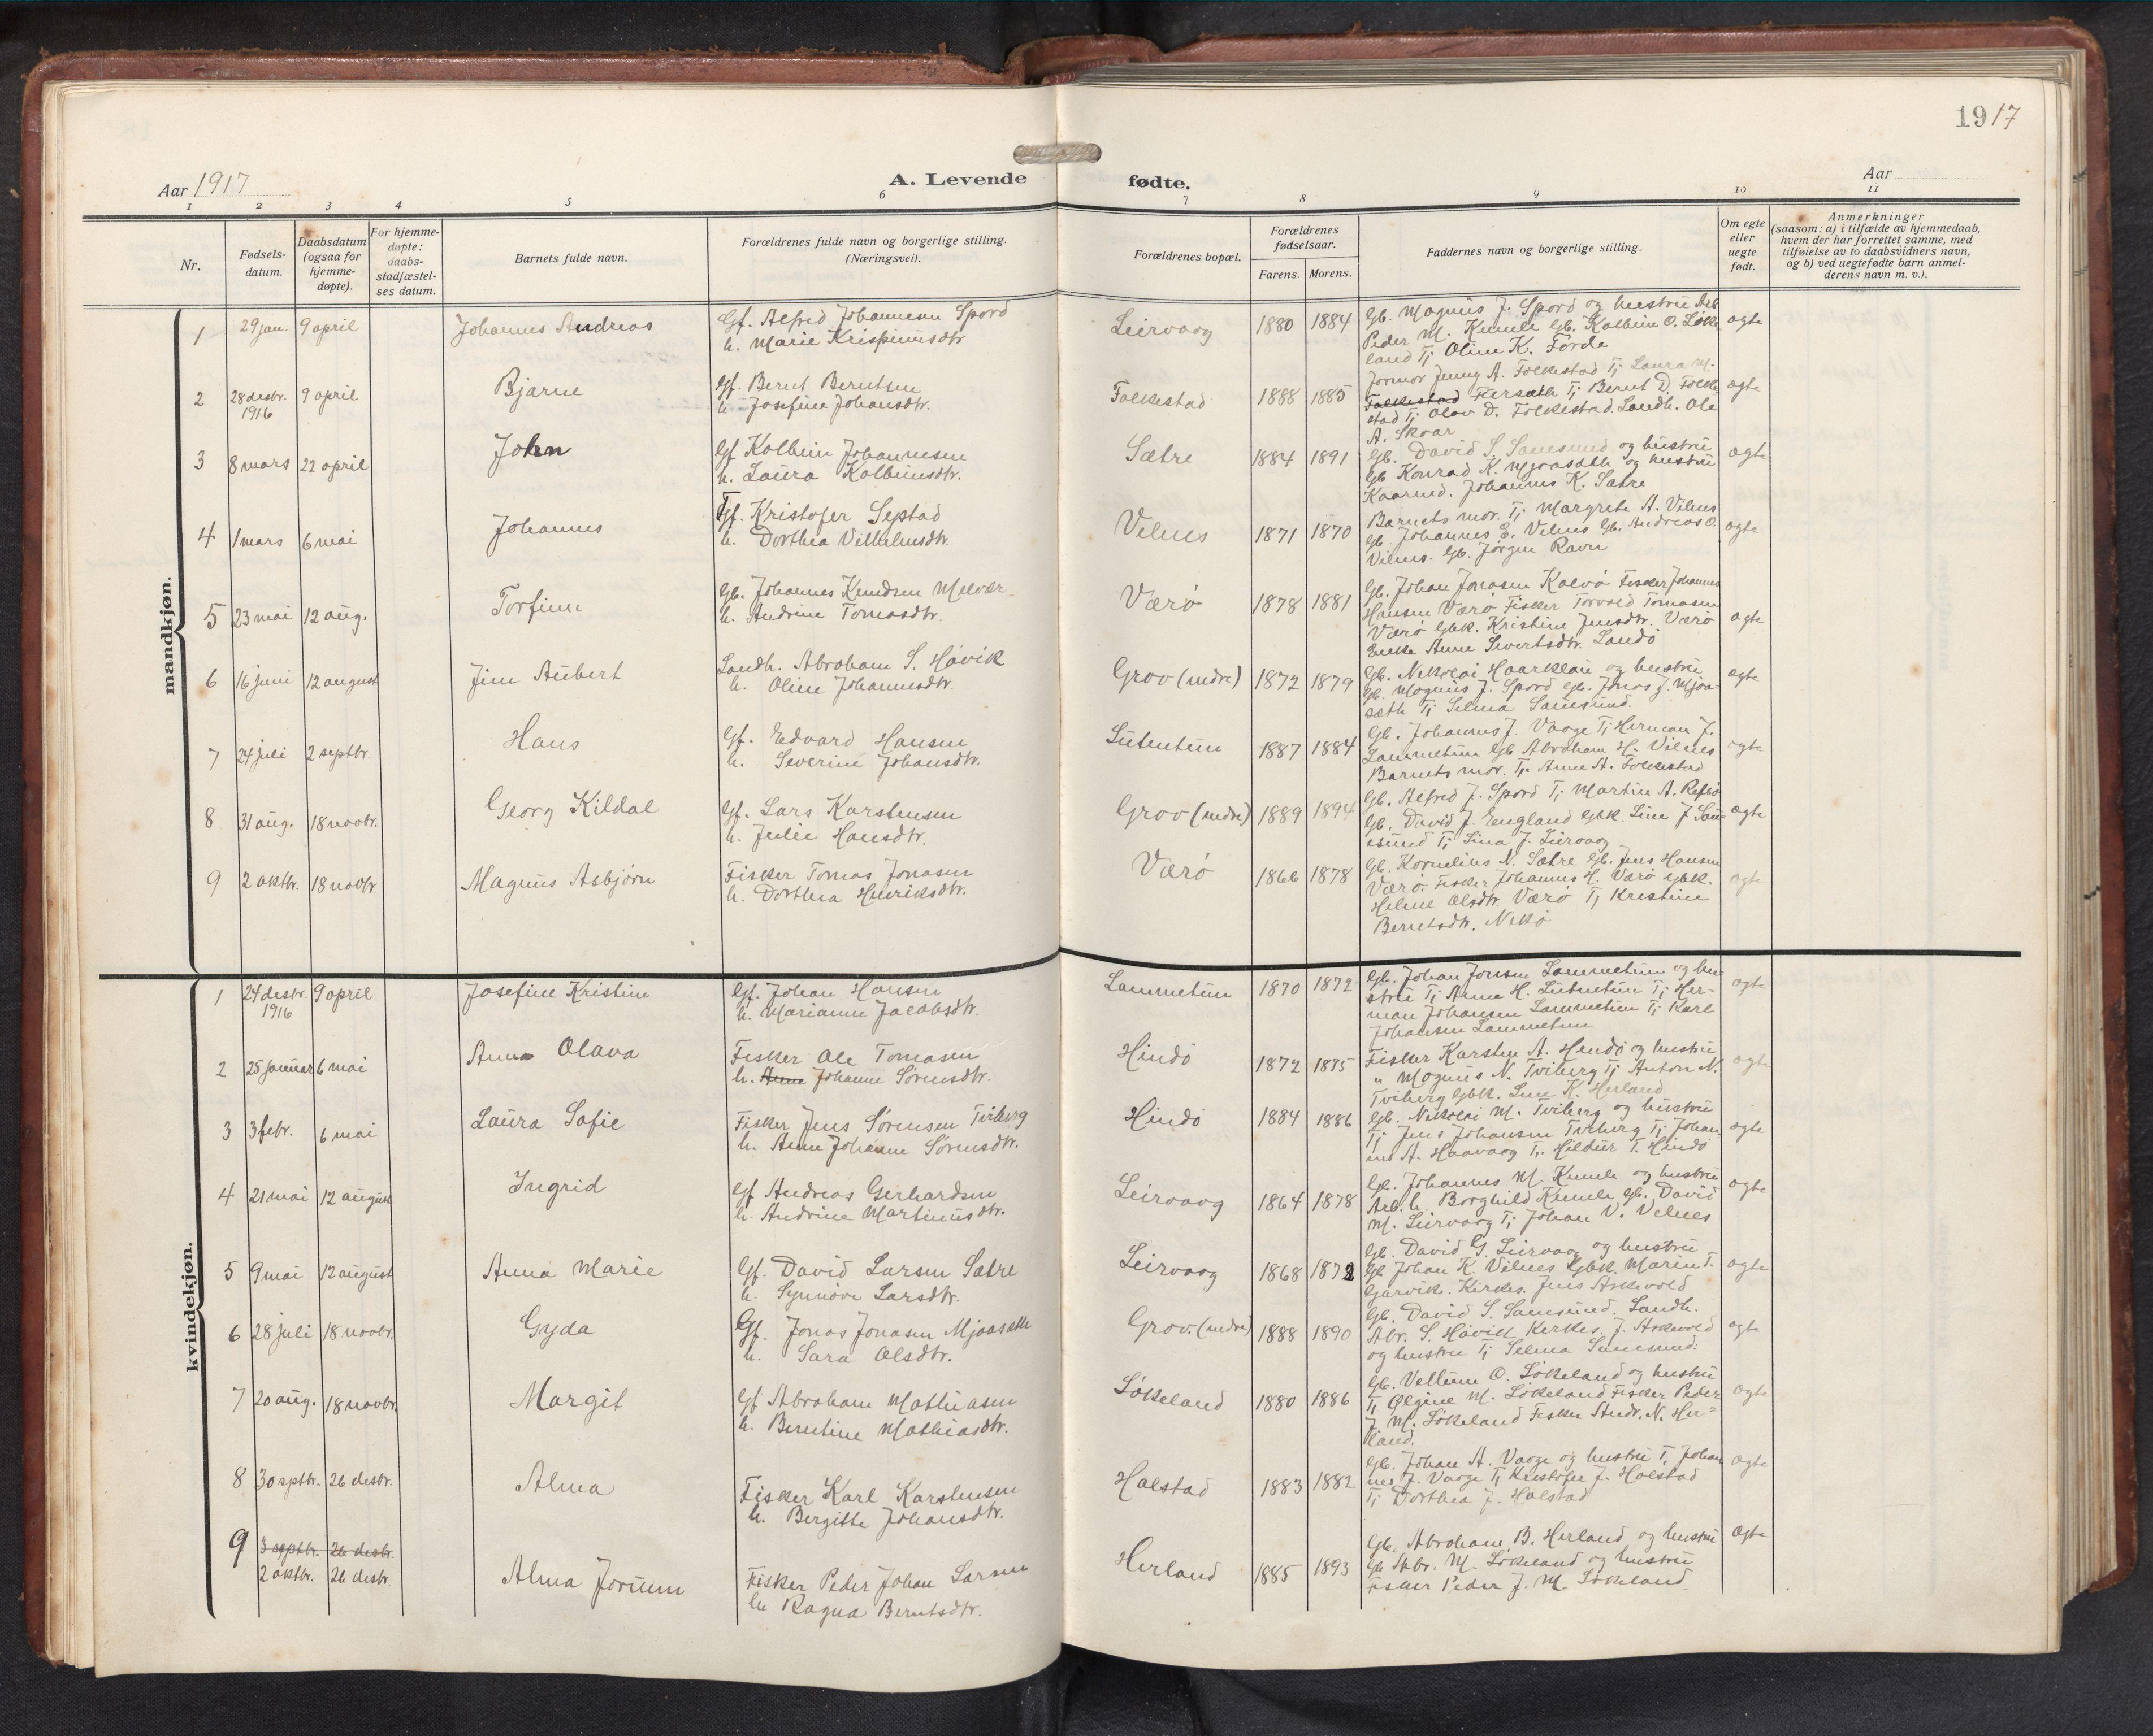 SAB, Askvoll sokneprestembete, H/Hab/Habb/L0002: Klokkerbok nr. B 2, 1910-1947, s. 18b-19a